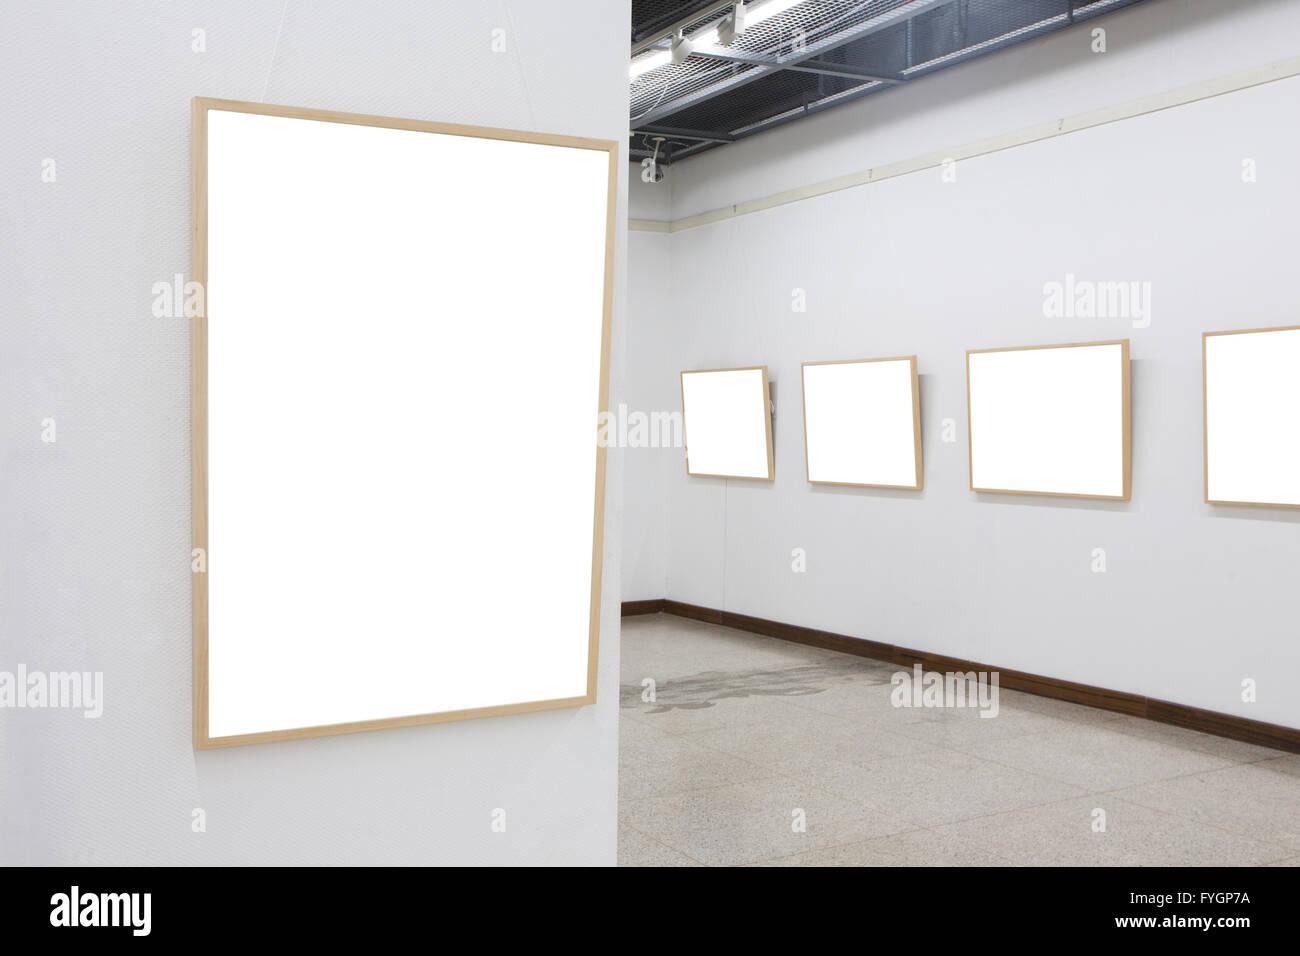 empty frames in museum Stock Photo: 103016238 - Alamy